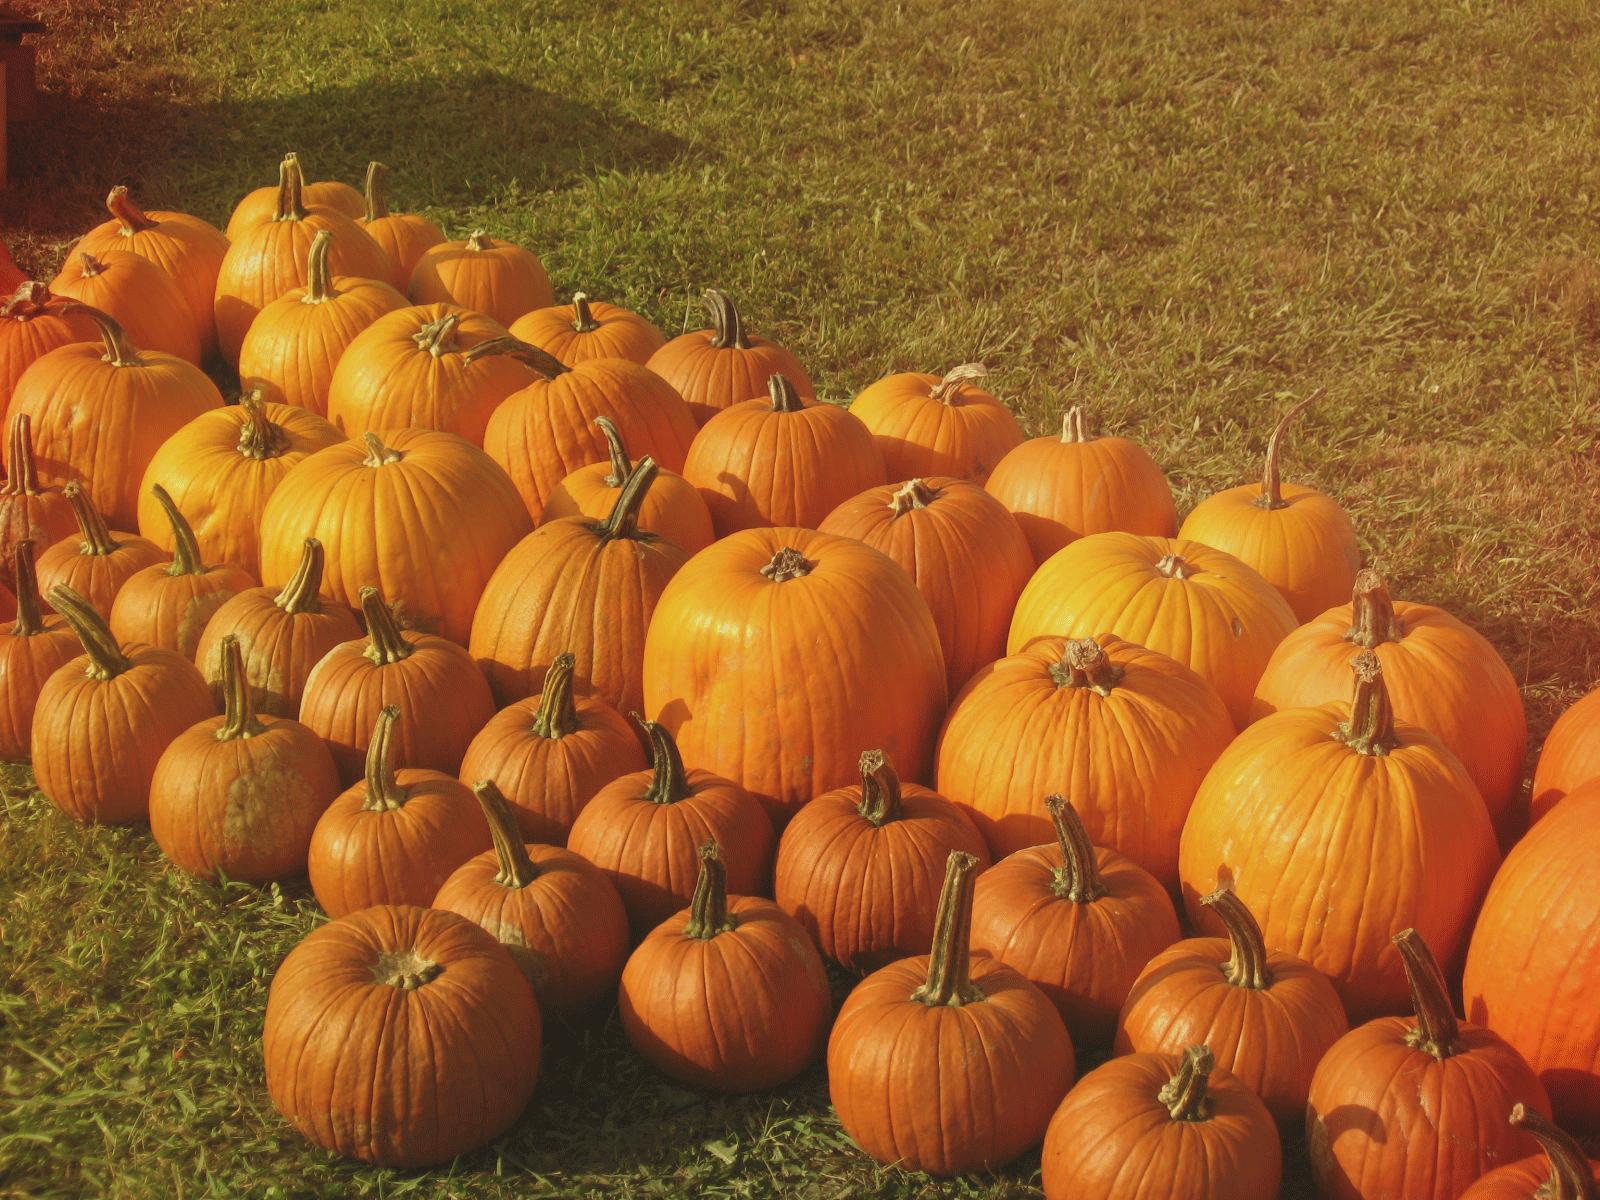 Ashe County Corn Maze and Pumpkin Festival